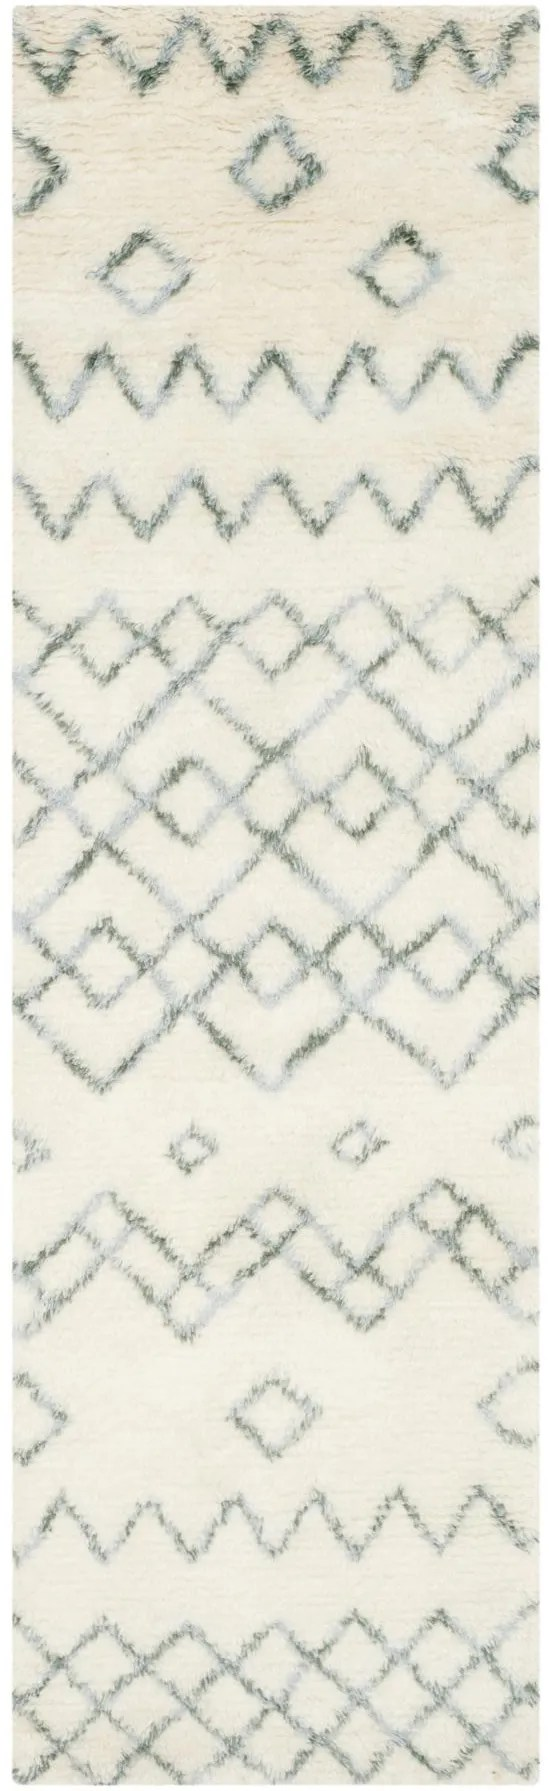 Lockheart Geometric Hand-Tufted Beige/Blue Area Rug Rug Size: Rectangle 4' x 6'